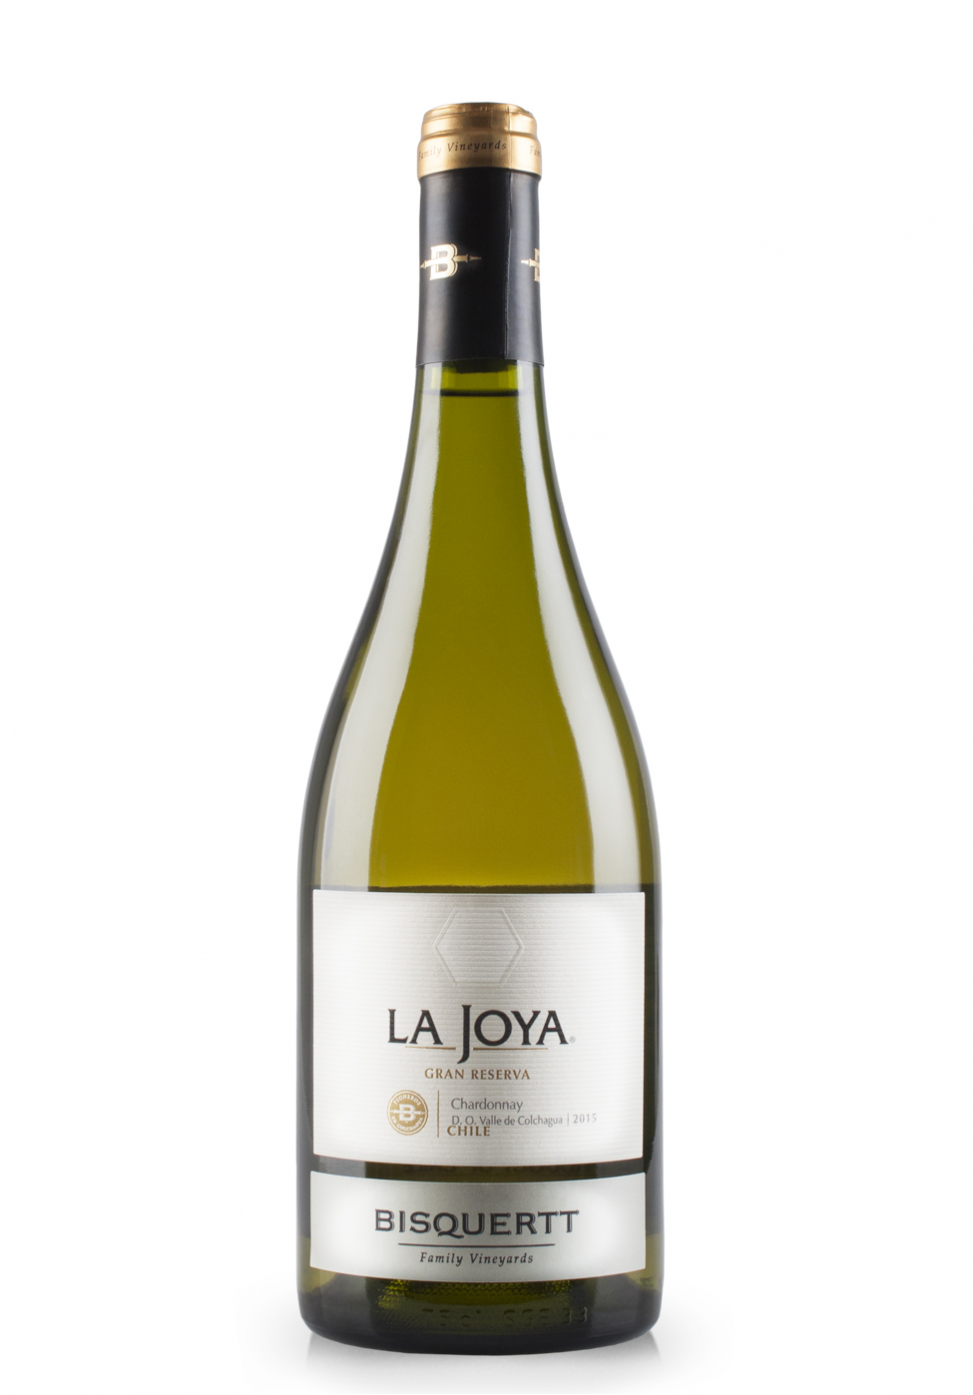 Vin Bisquertt, La Joya Chardonnay Gran Reserva 2015 (0.75L)